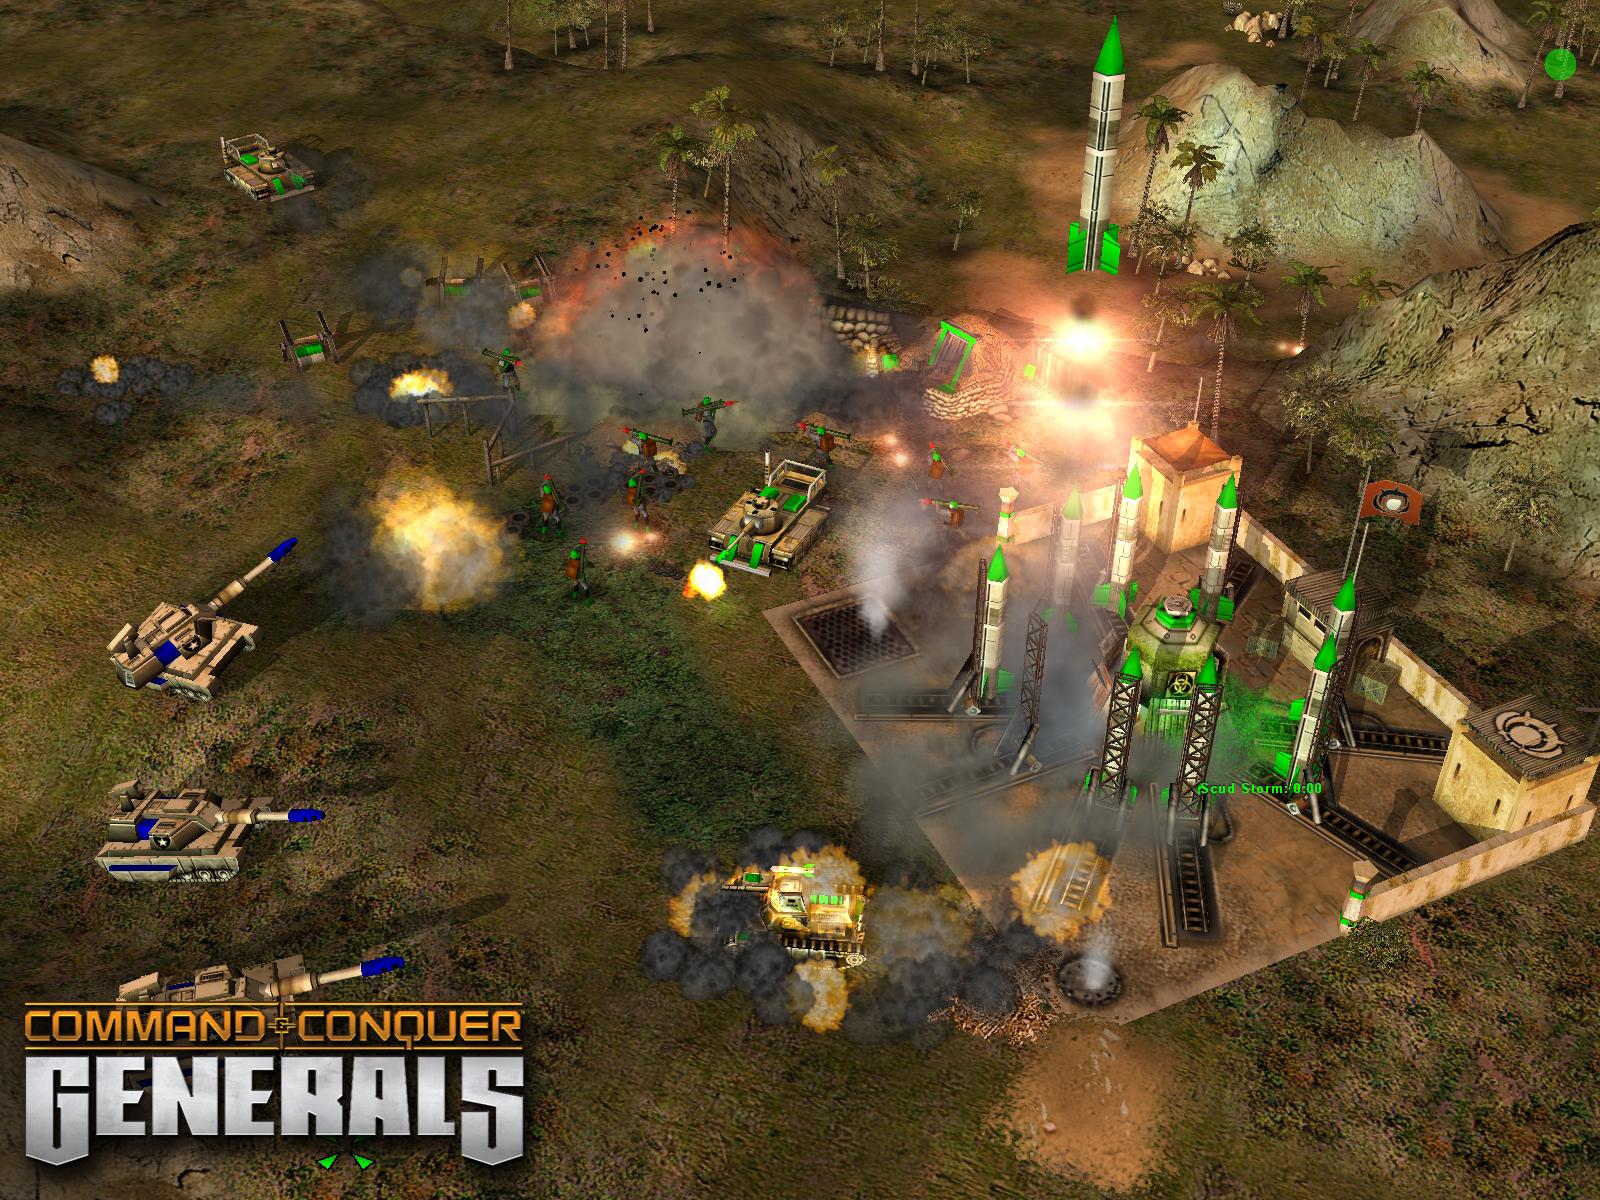 c&c generals zero hour the last stand mod free download